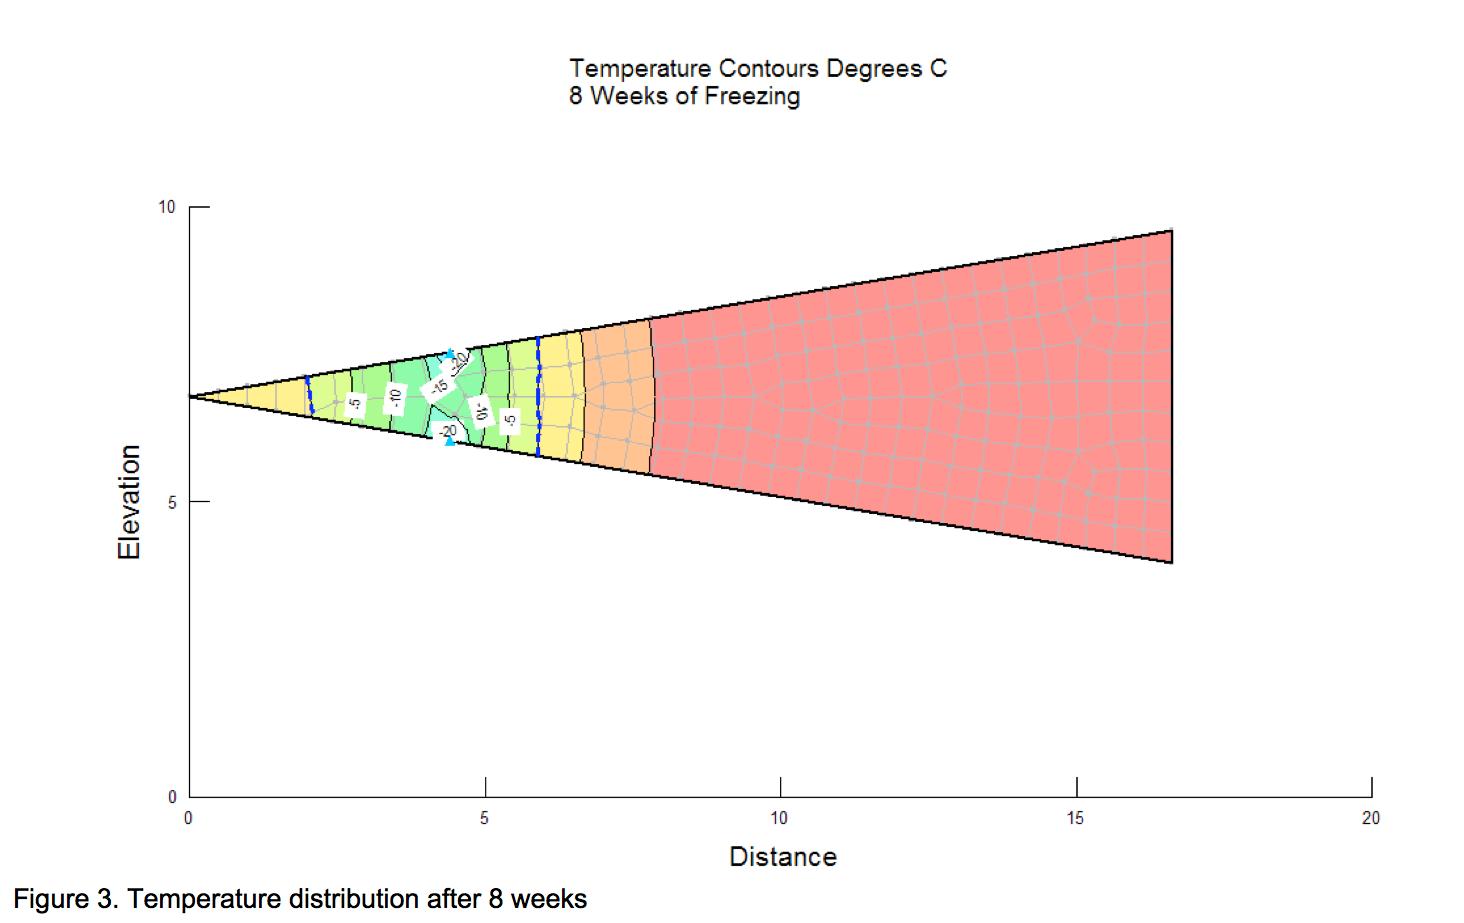 Figure 3: Temperature distribution after 8 weeks